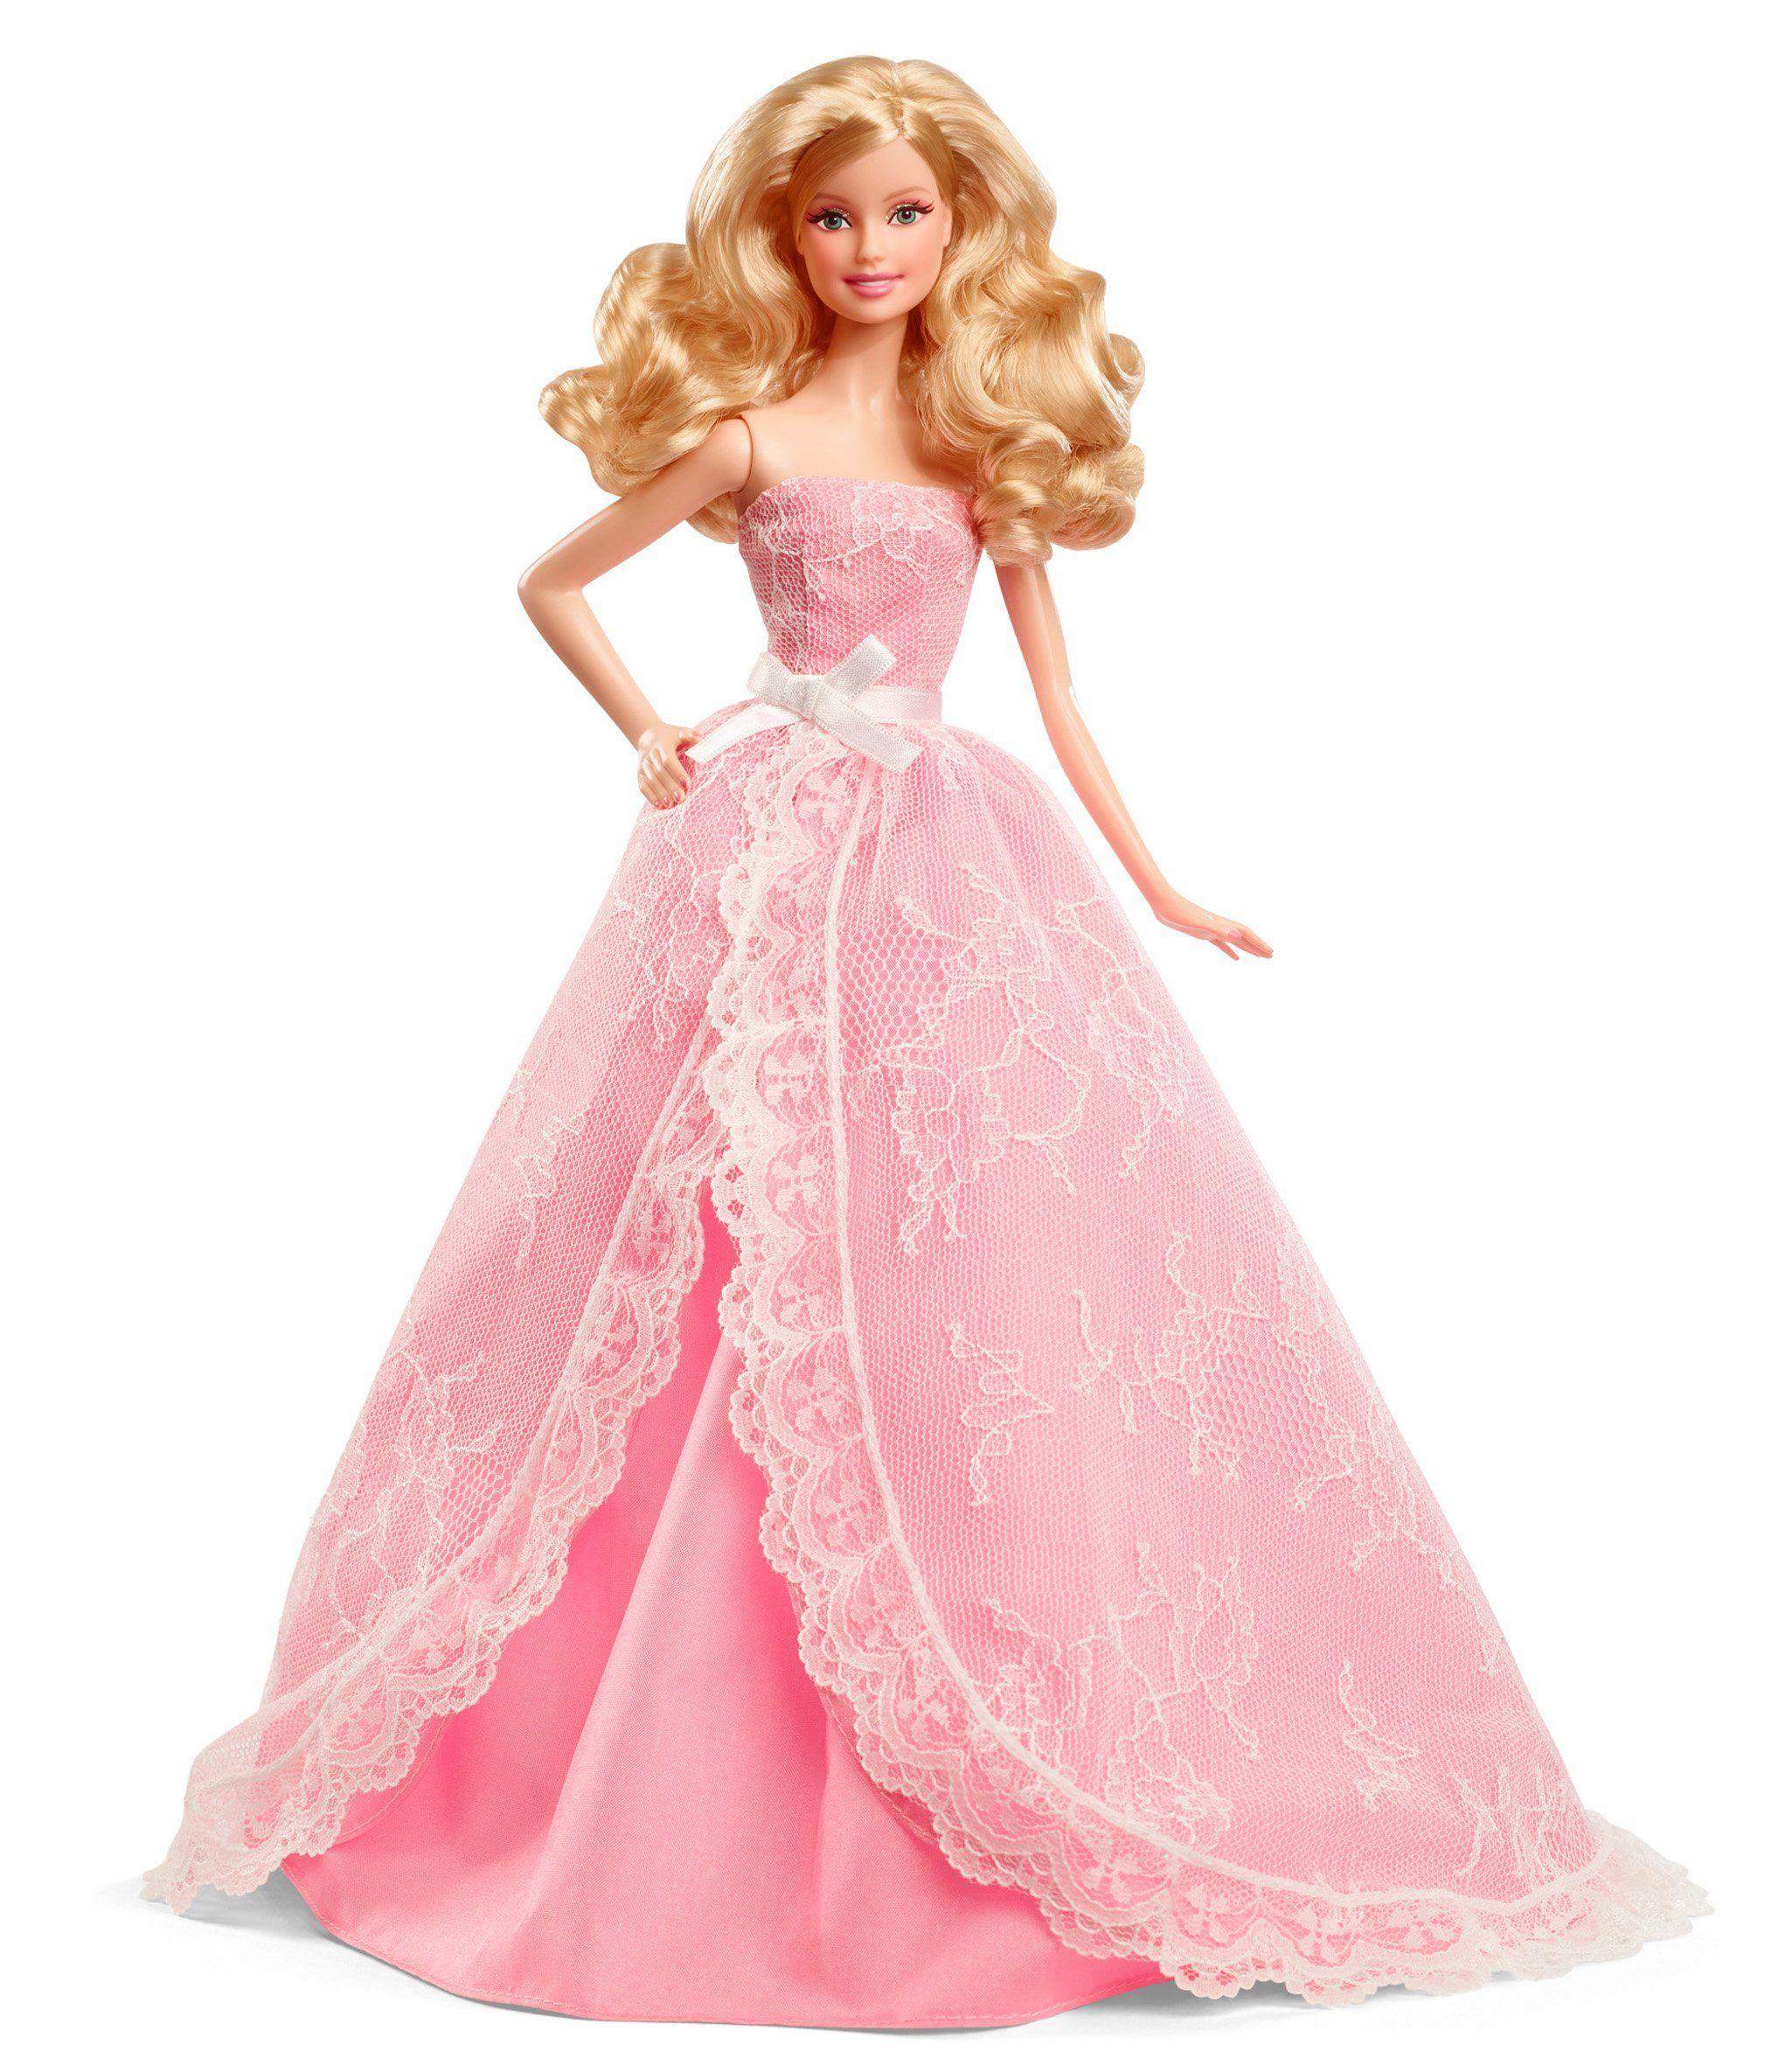 ea5ea46a58534 Barbie 2015 Birthday Wishes Barbie Doll | Kitchen in 2019 | Barbie ...